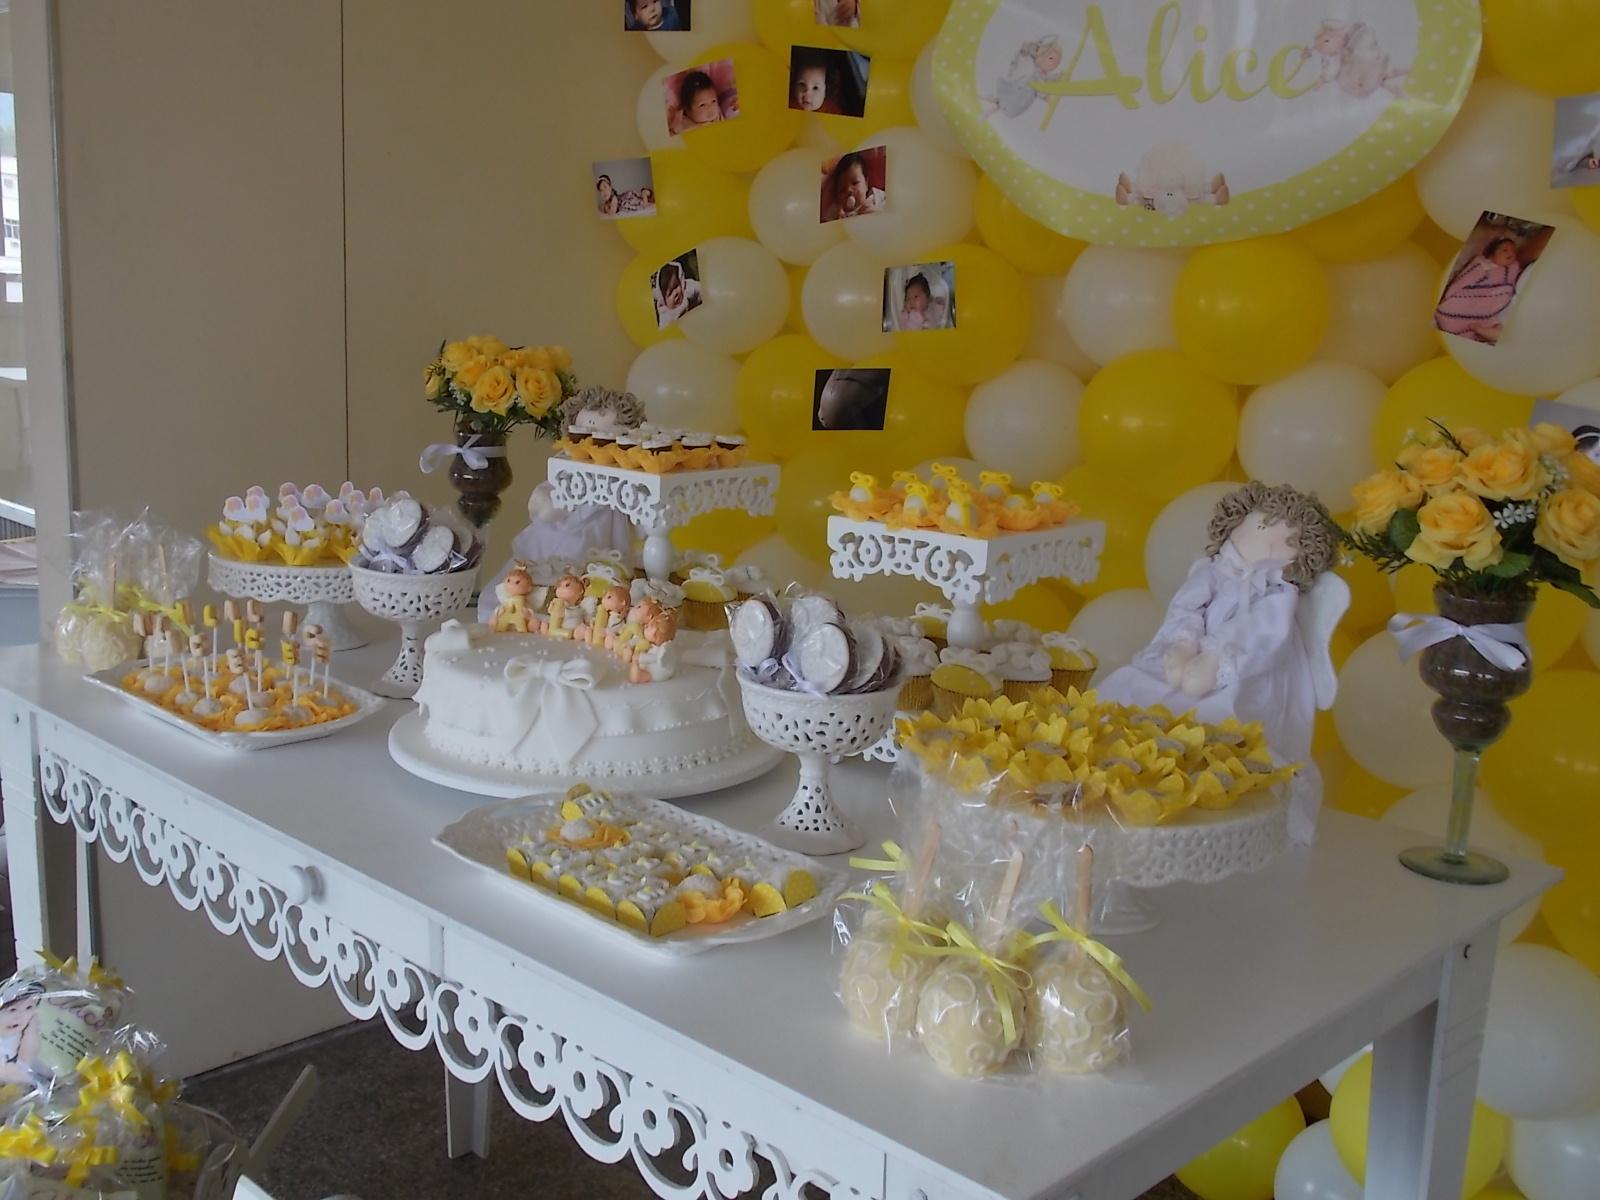 decoracao branco amarelo : decoracao branco amarelo:Decoracao De Festa Amarelo E Branco